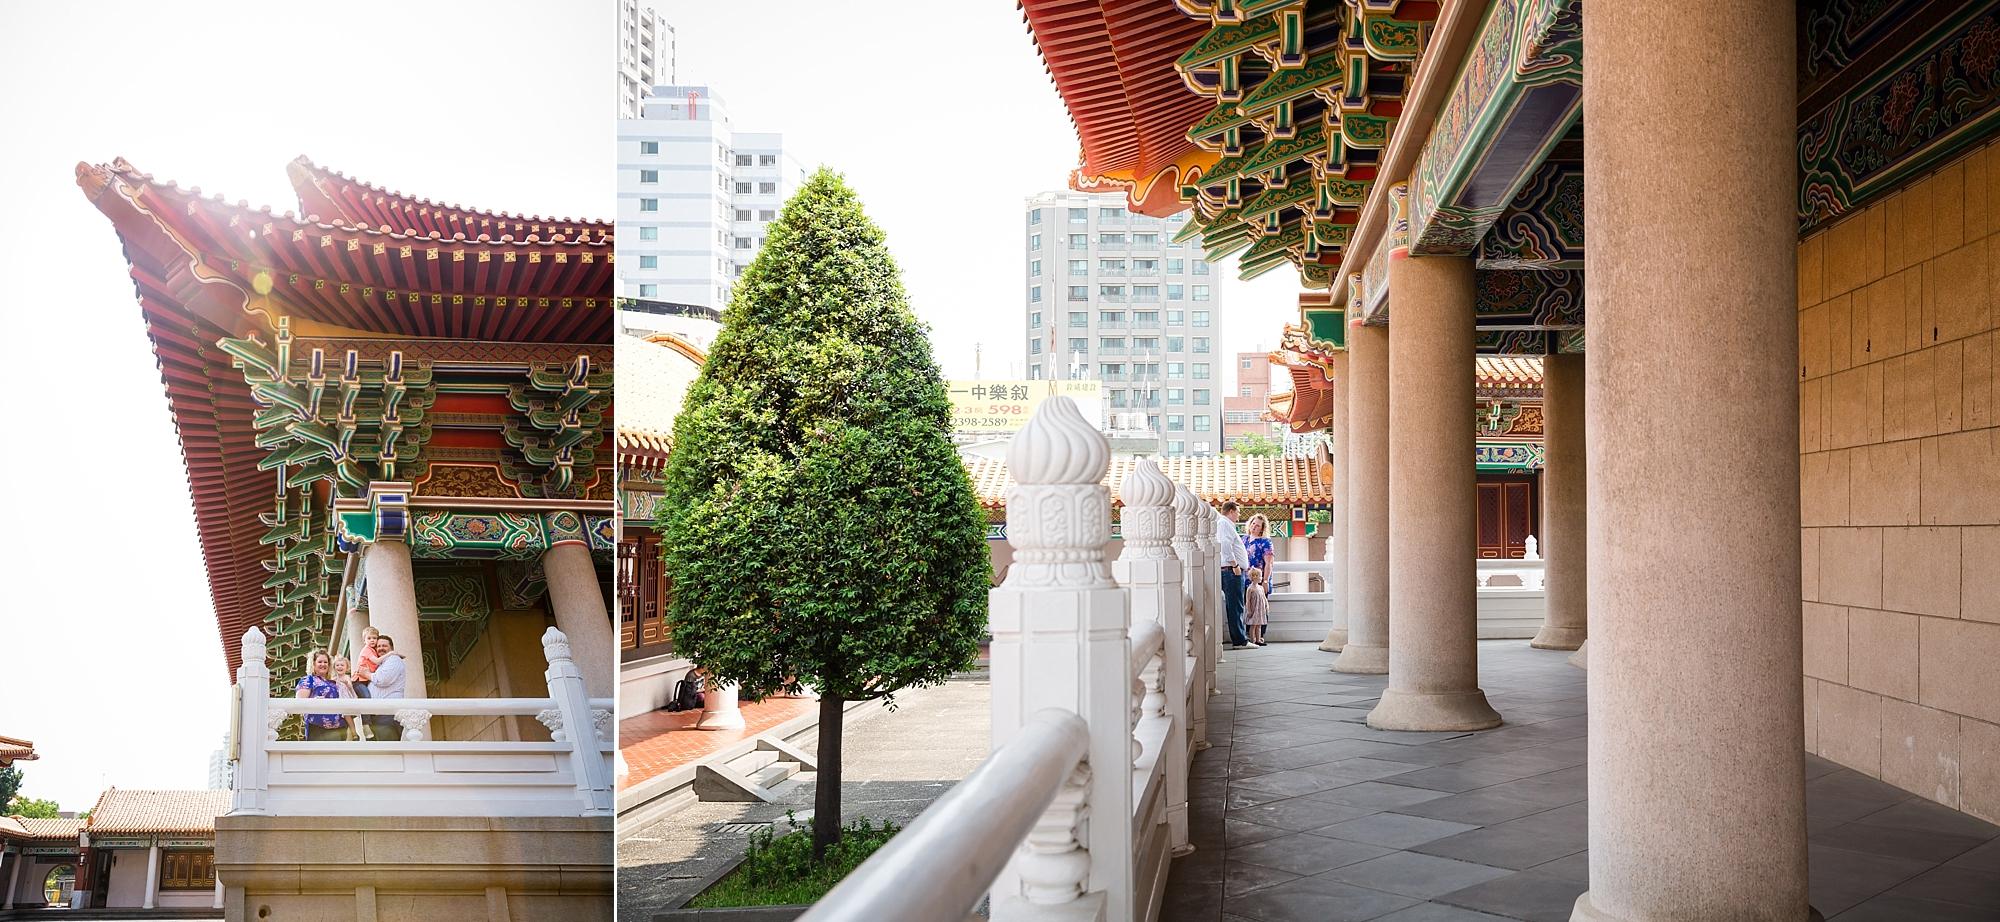 Outdoor_Lifestyle_Family_Photos_Taiwan_Hunnicutt_Photography_0024